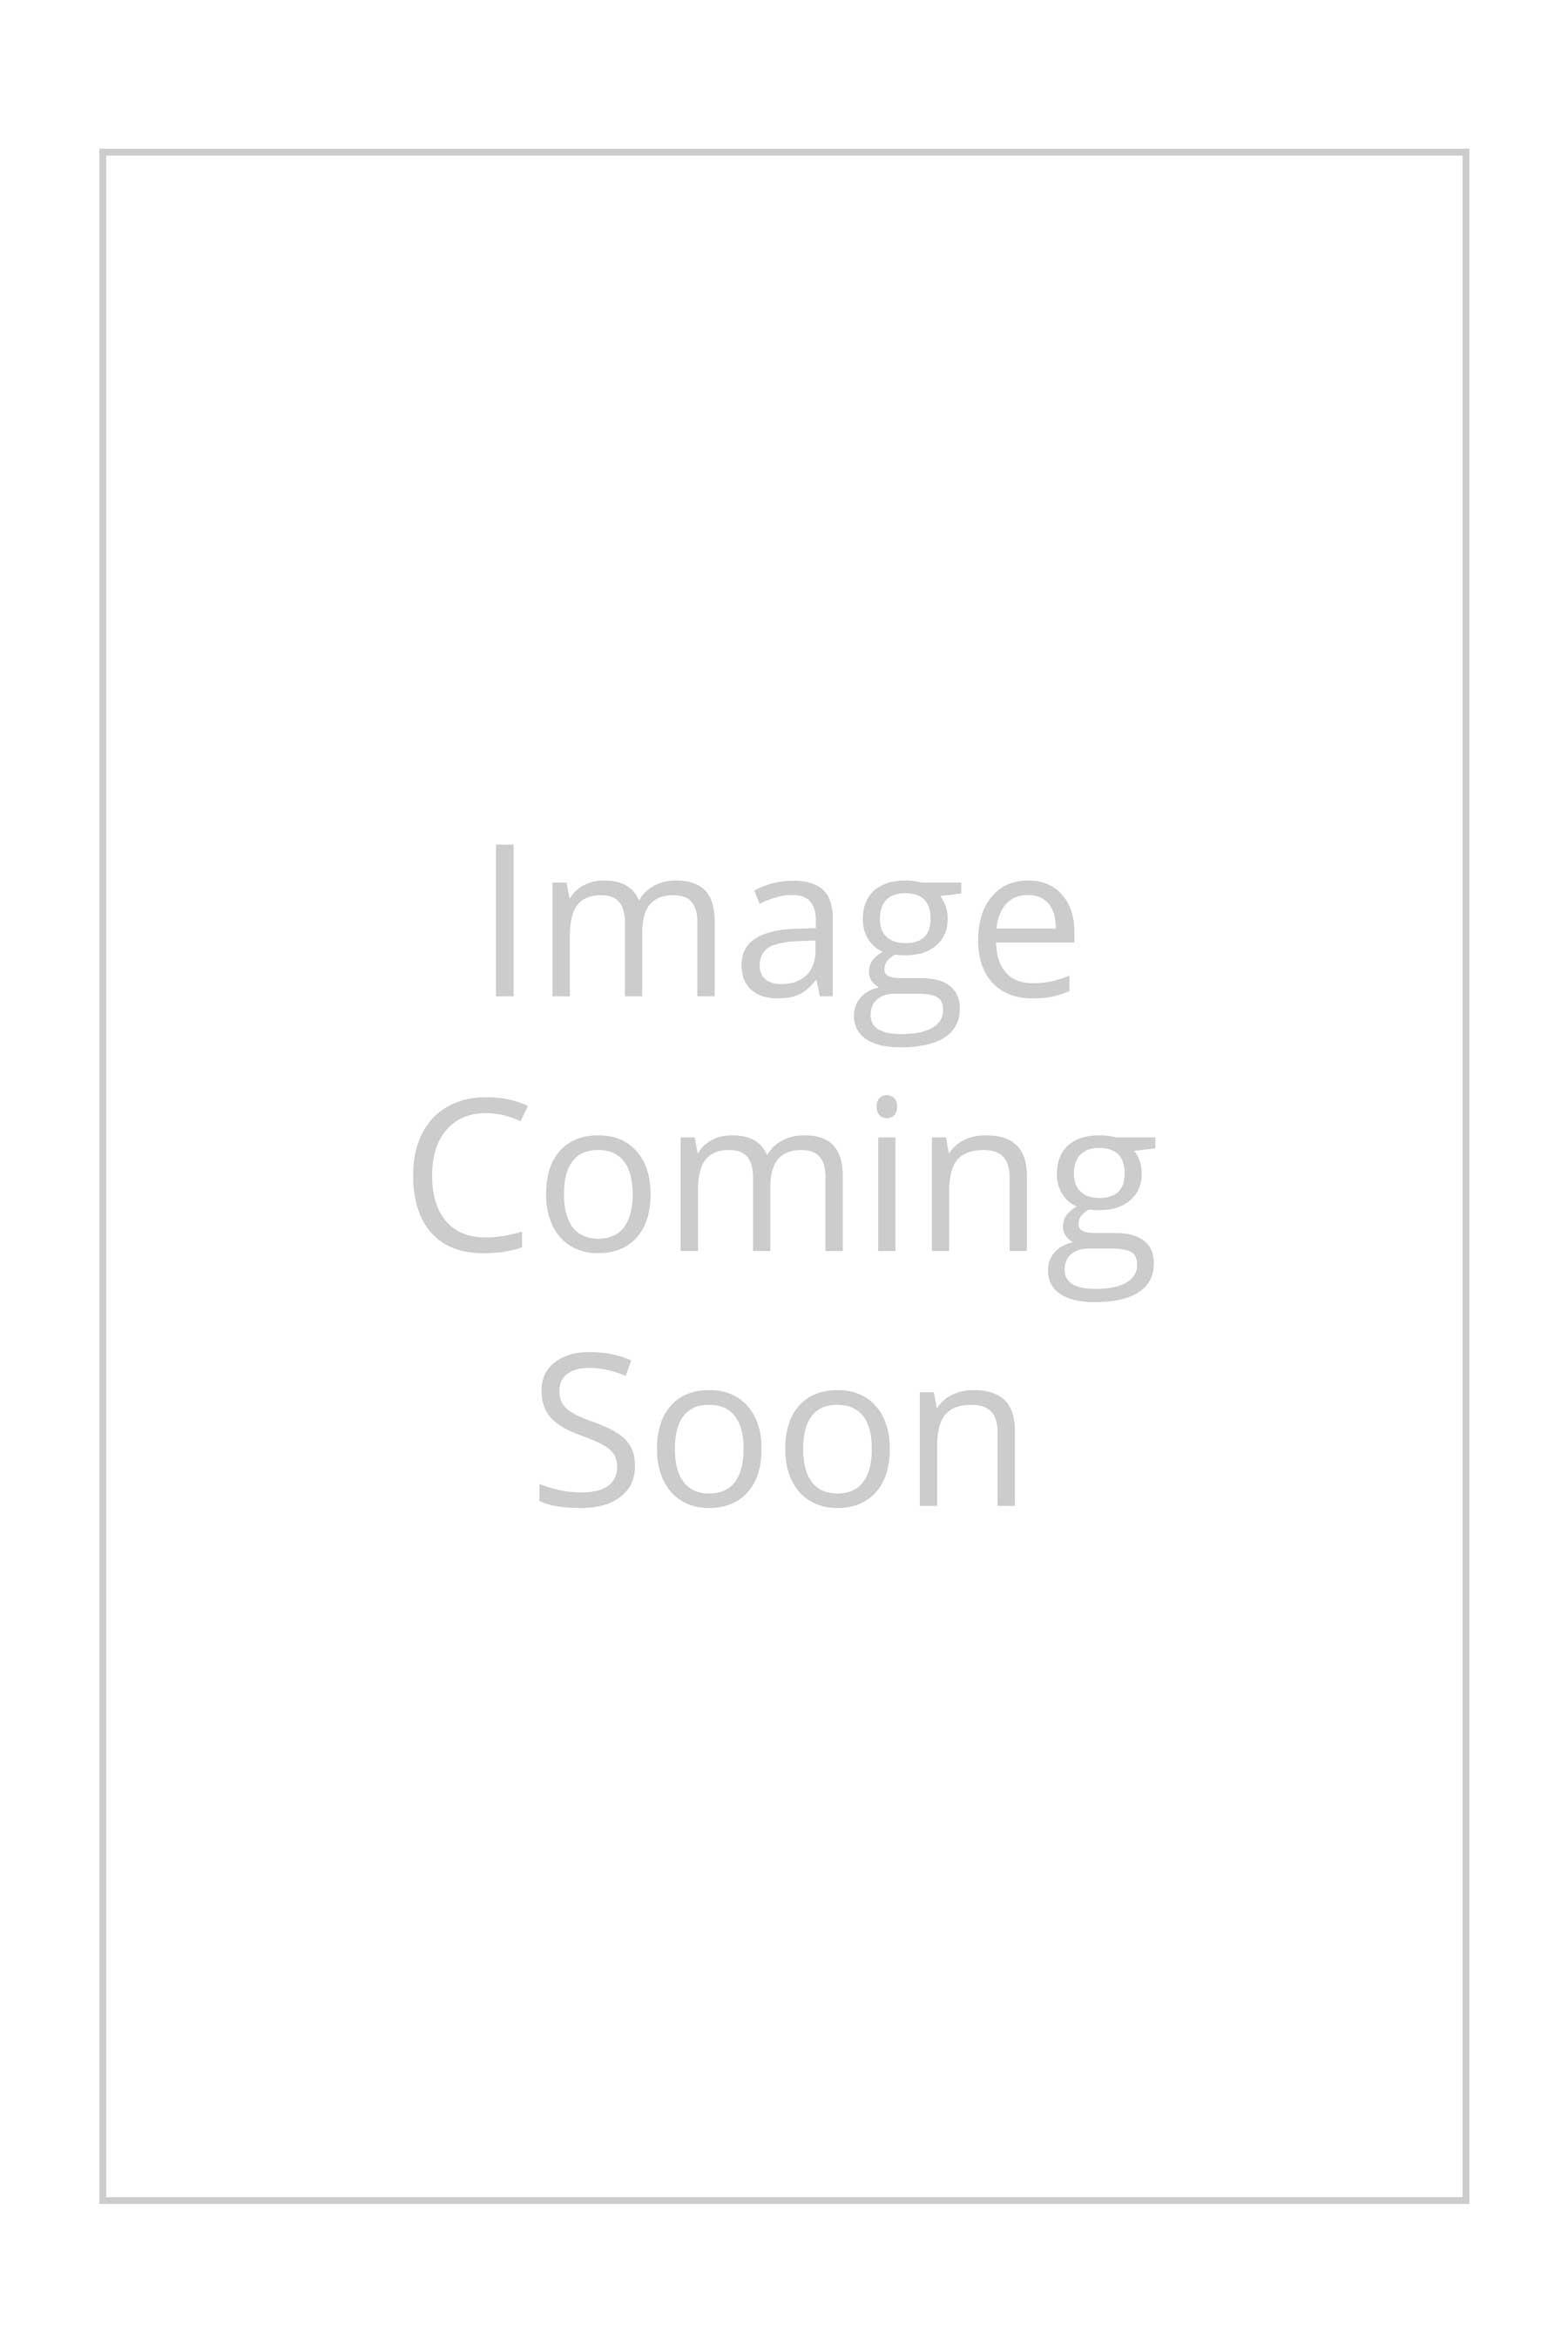 St John Sleeveless Empire Cut Santana Knit Top in Off-White